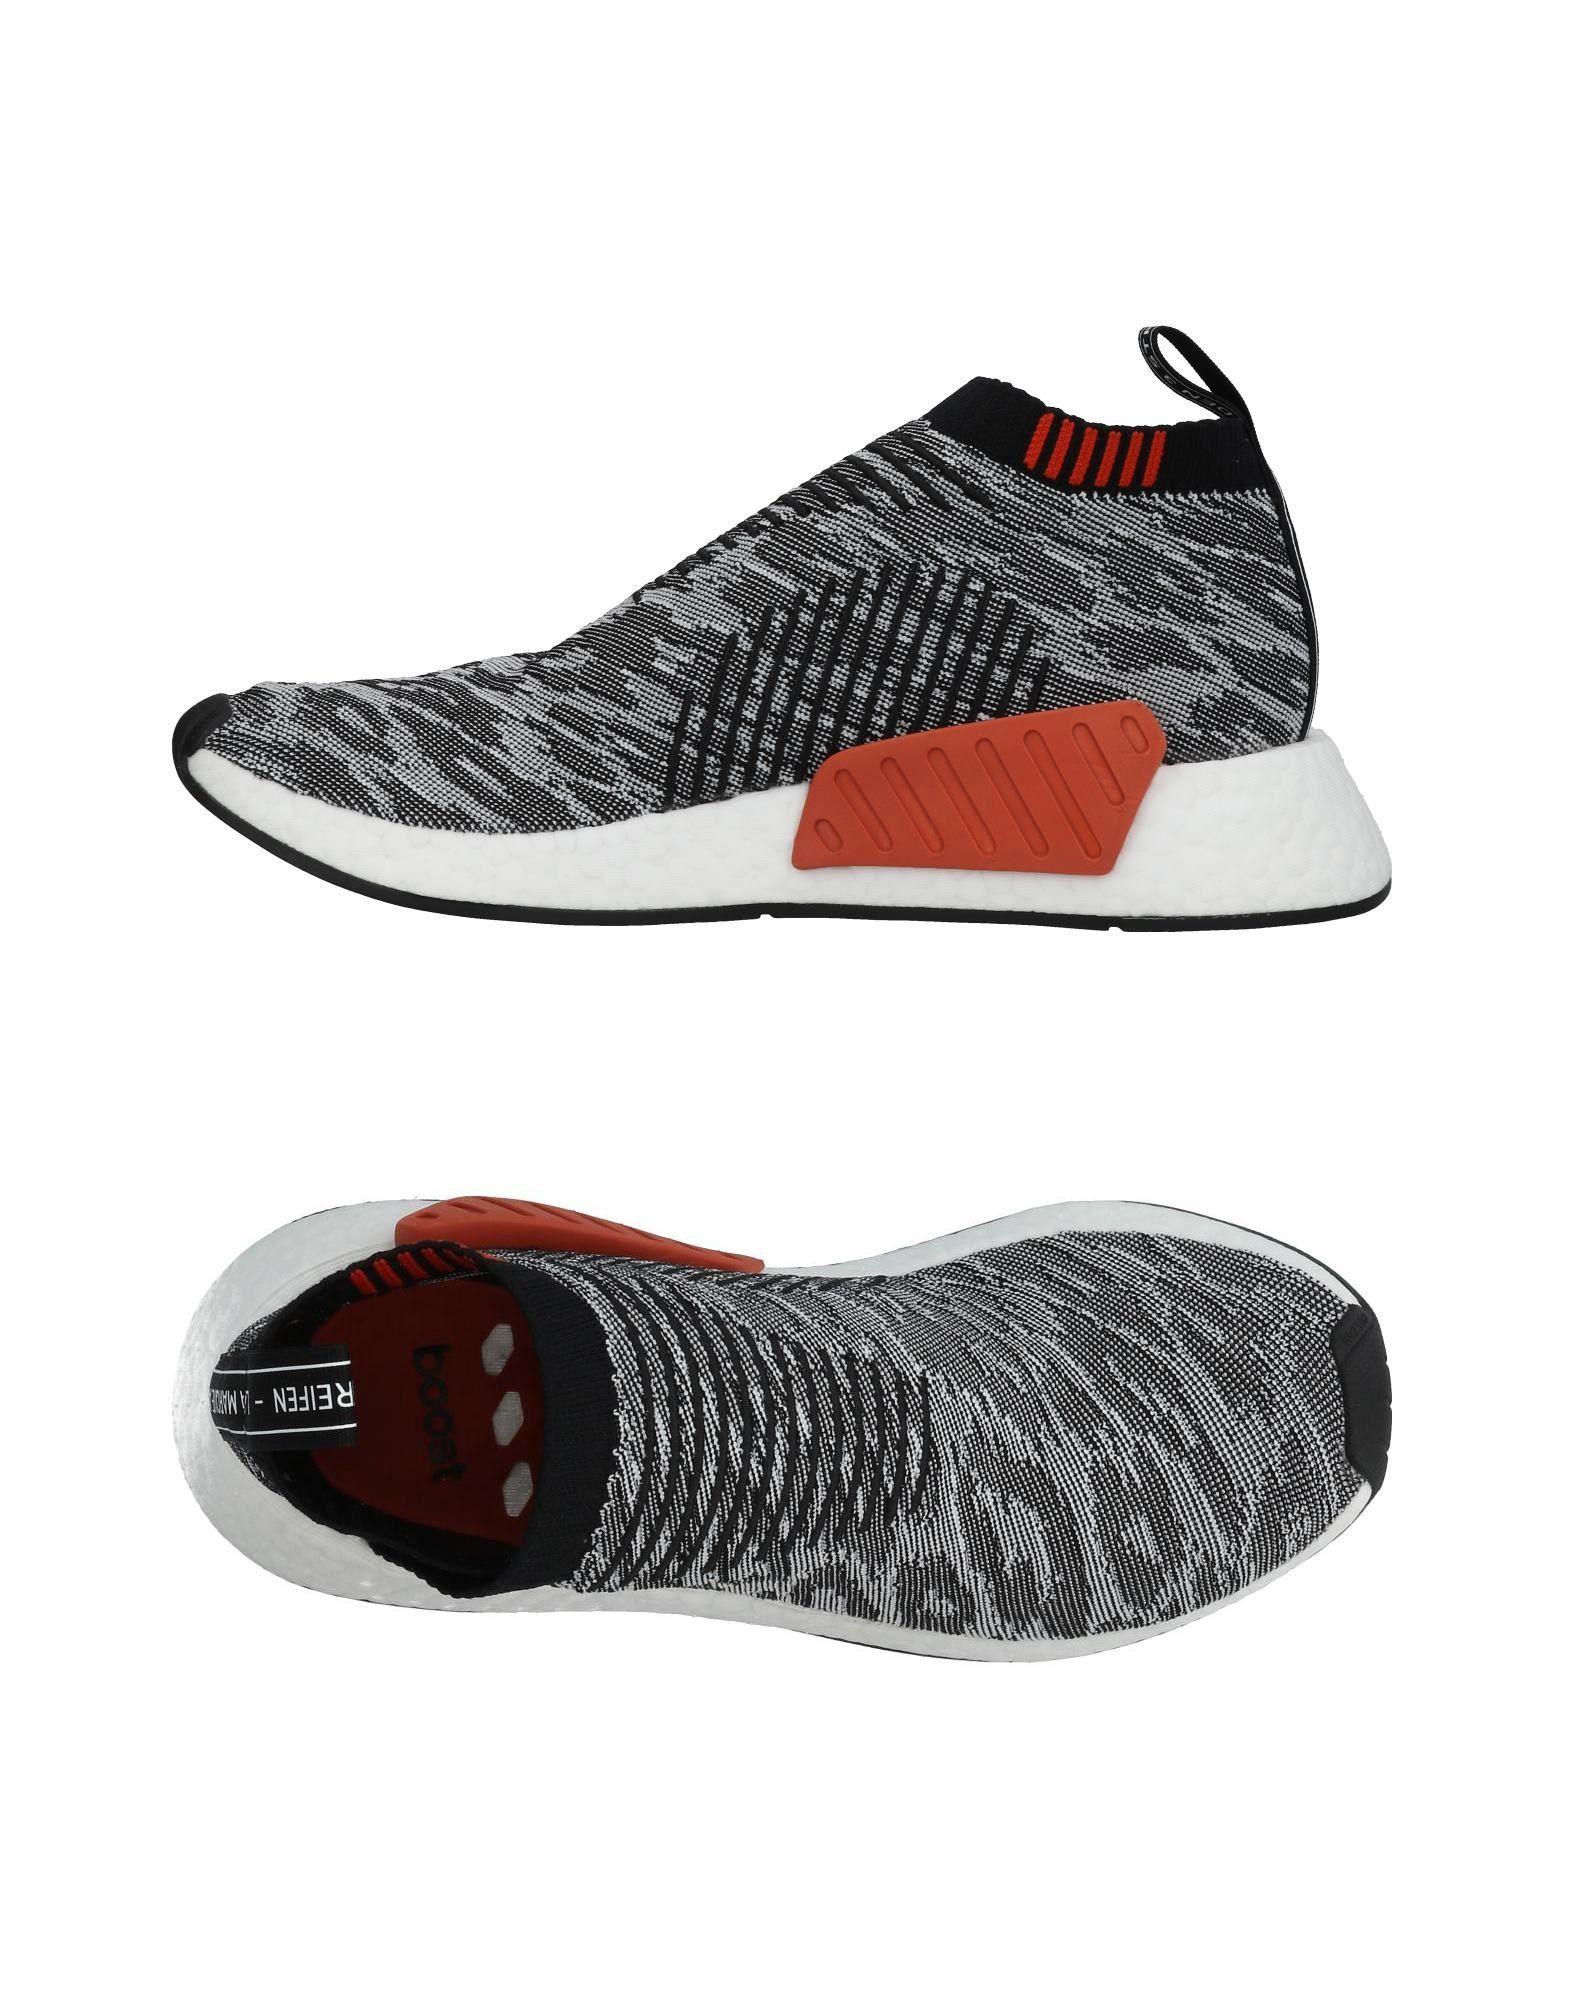 Scarpe da Ginnastica Adidas Uomo - 11461619JI